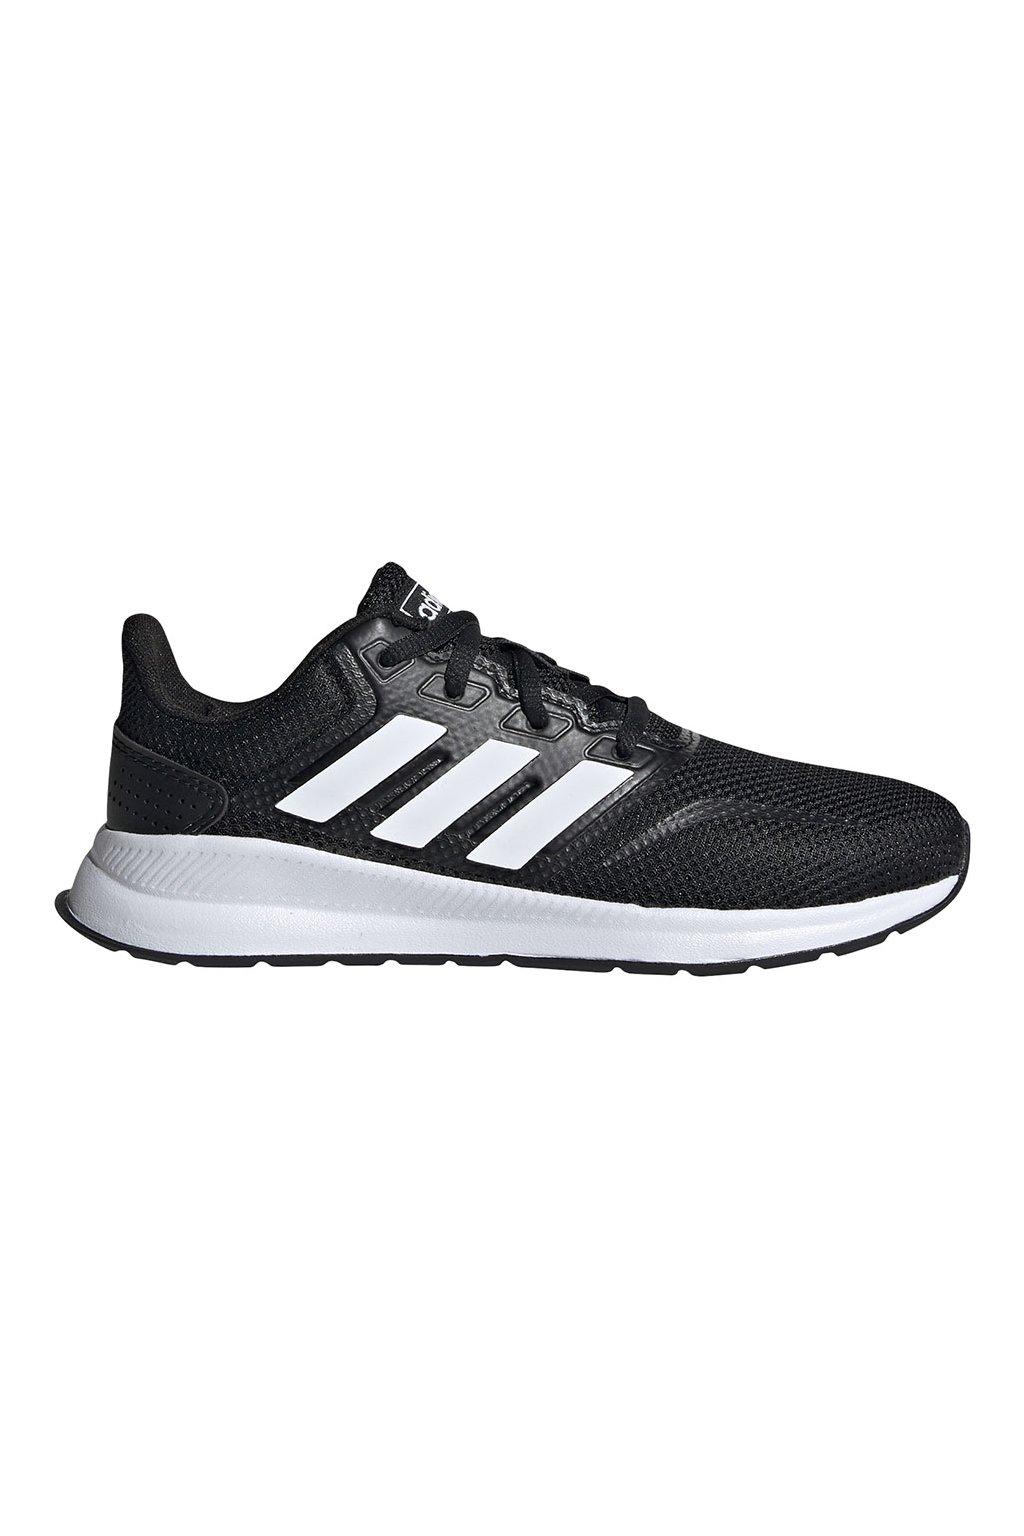 Detská obuv Adidas Runfalcon K čierno biela EG2545